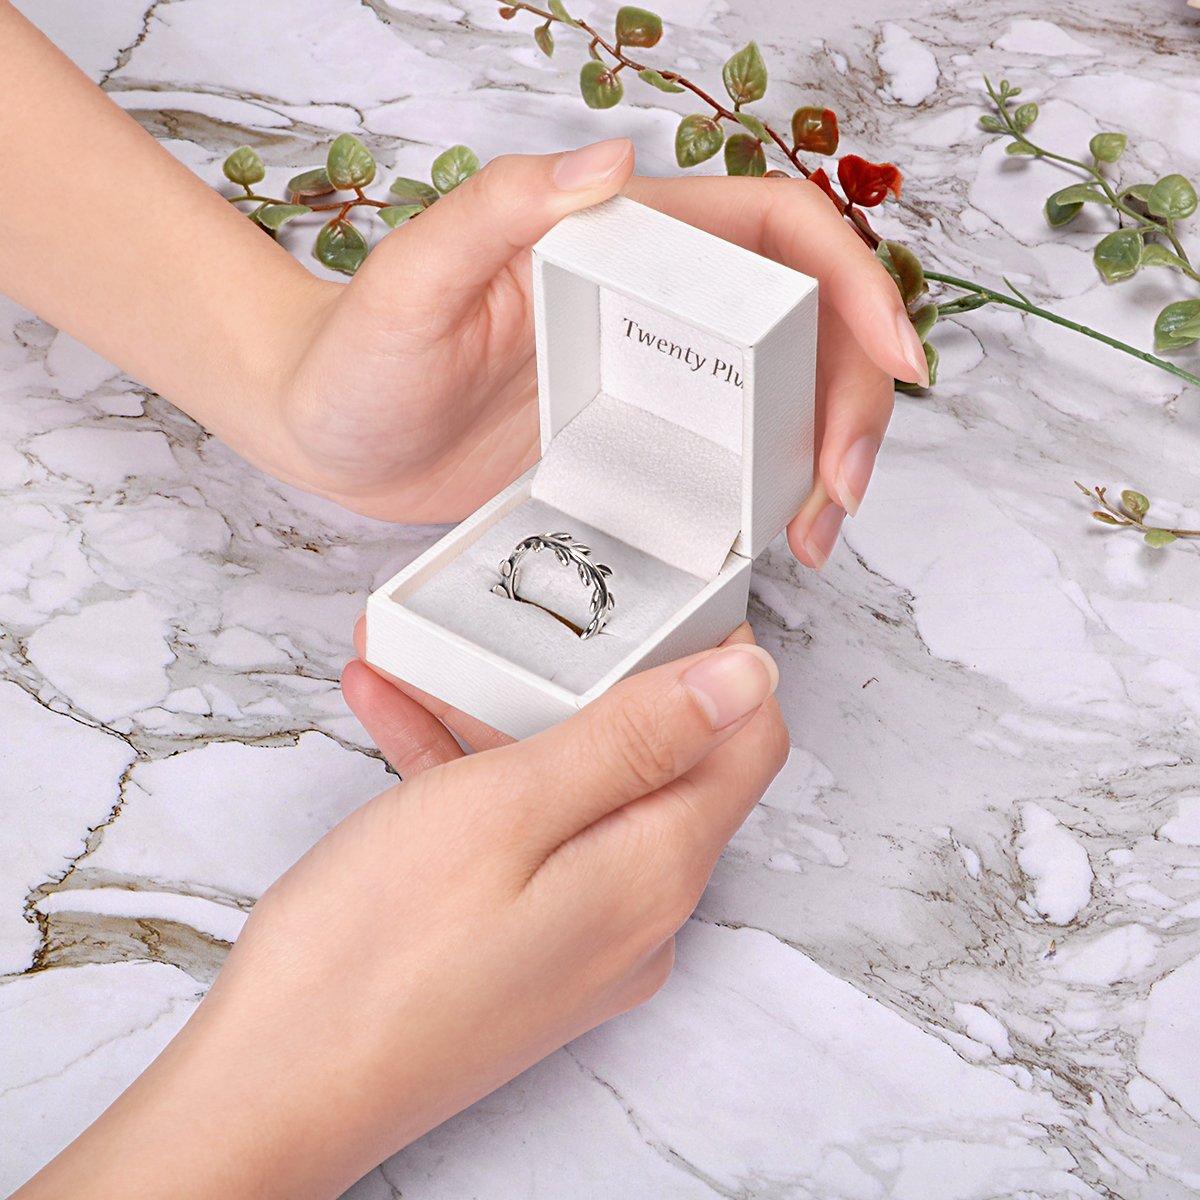 Twenty Plus Simple Sterling Silver Laurel Wreath Finger Ring Gifts For Women & Girls by Twenty Plus (Image #5)